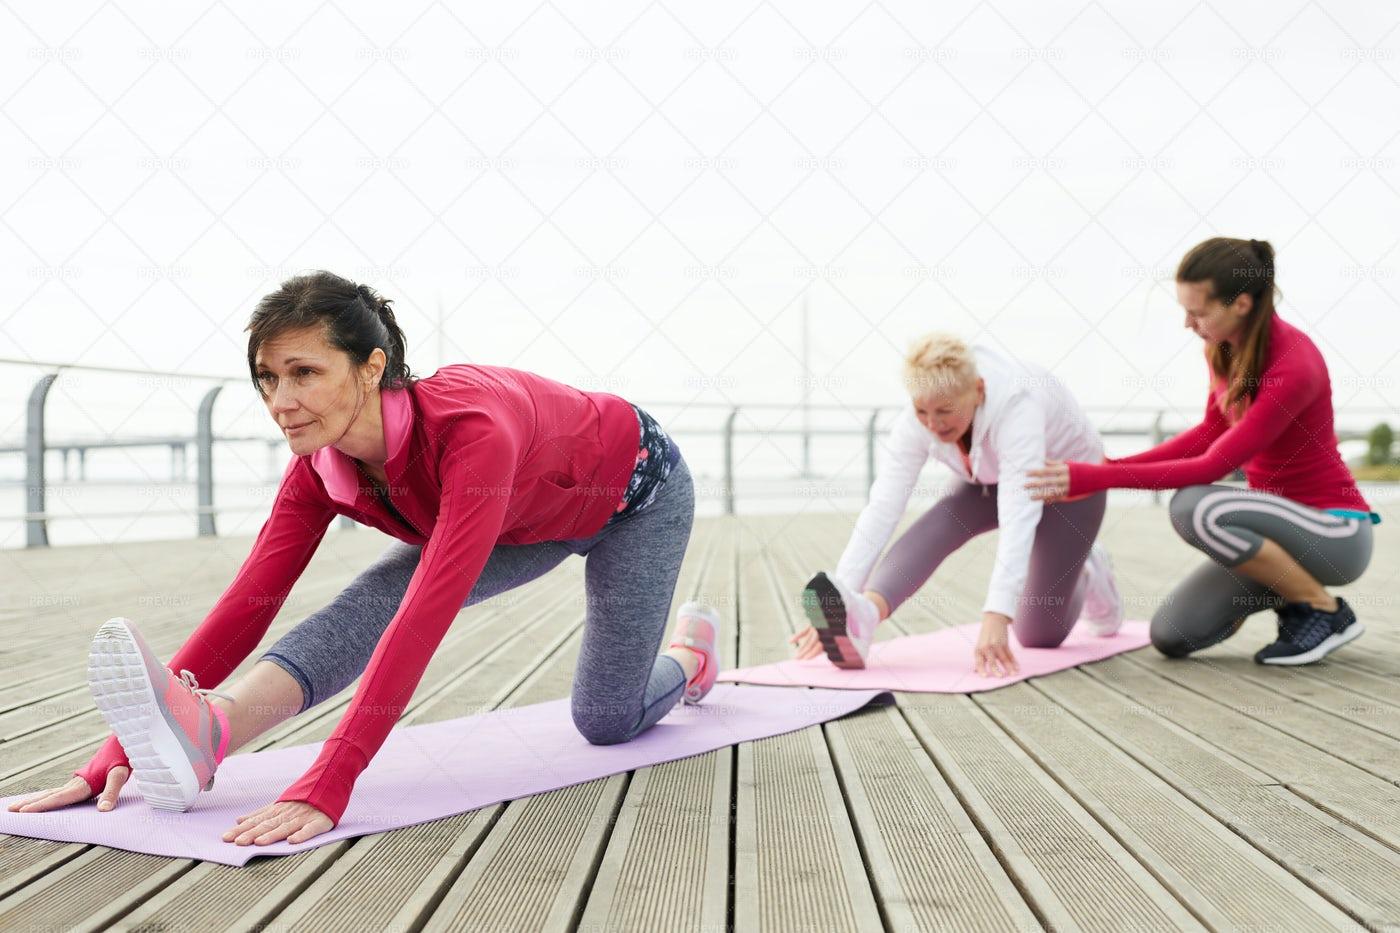 Yoga Class For Mature Women: Stock Photos